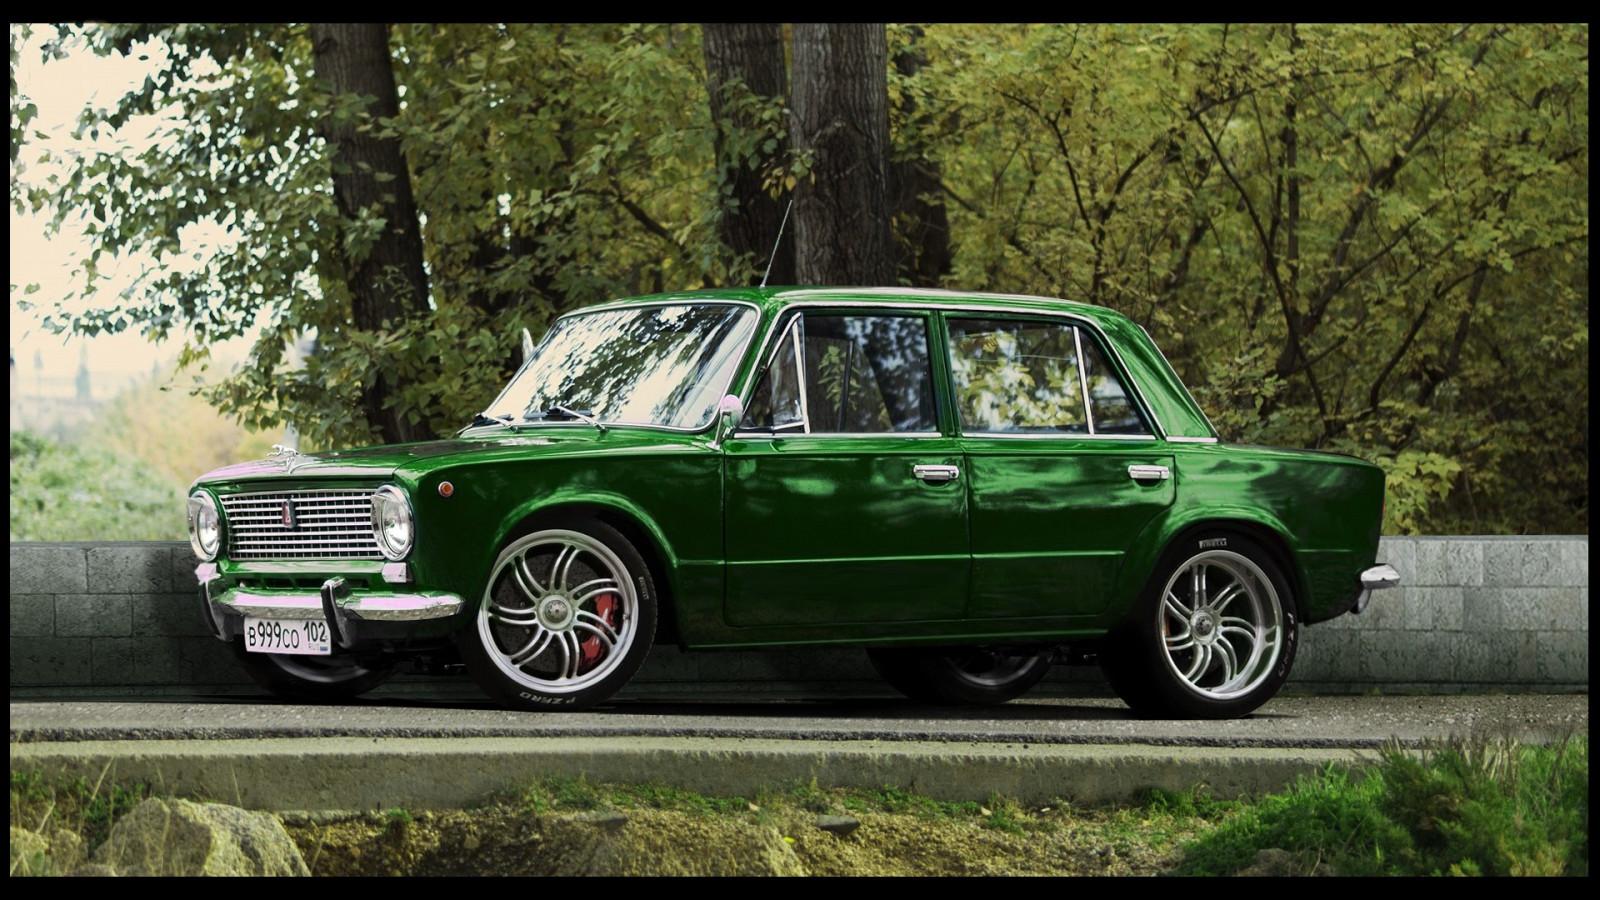 Car Vehicle LADA Sports Car Green Cars Convertible Sedan Land Vehicle  Automobile Make Luxury Vehicle Family